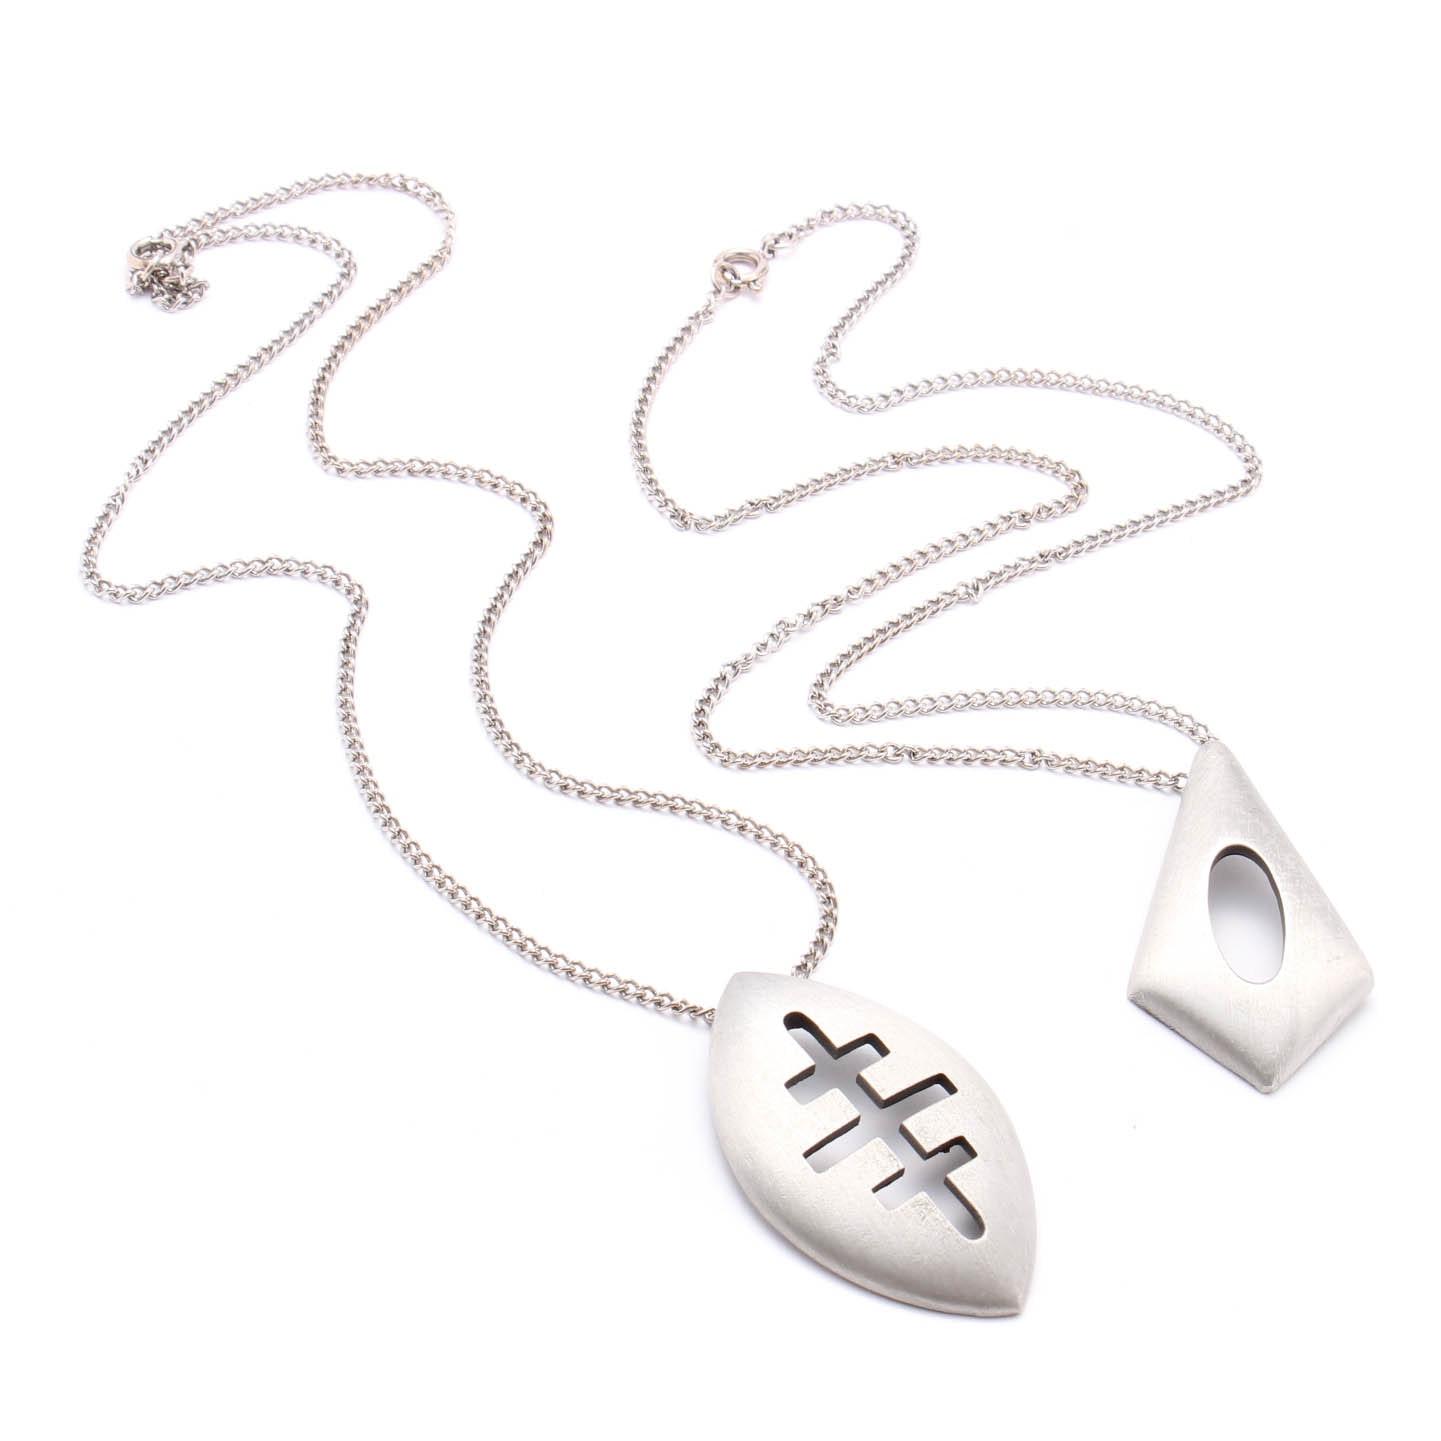 Vintage Pewter Necklaces